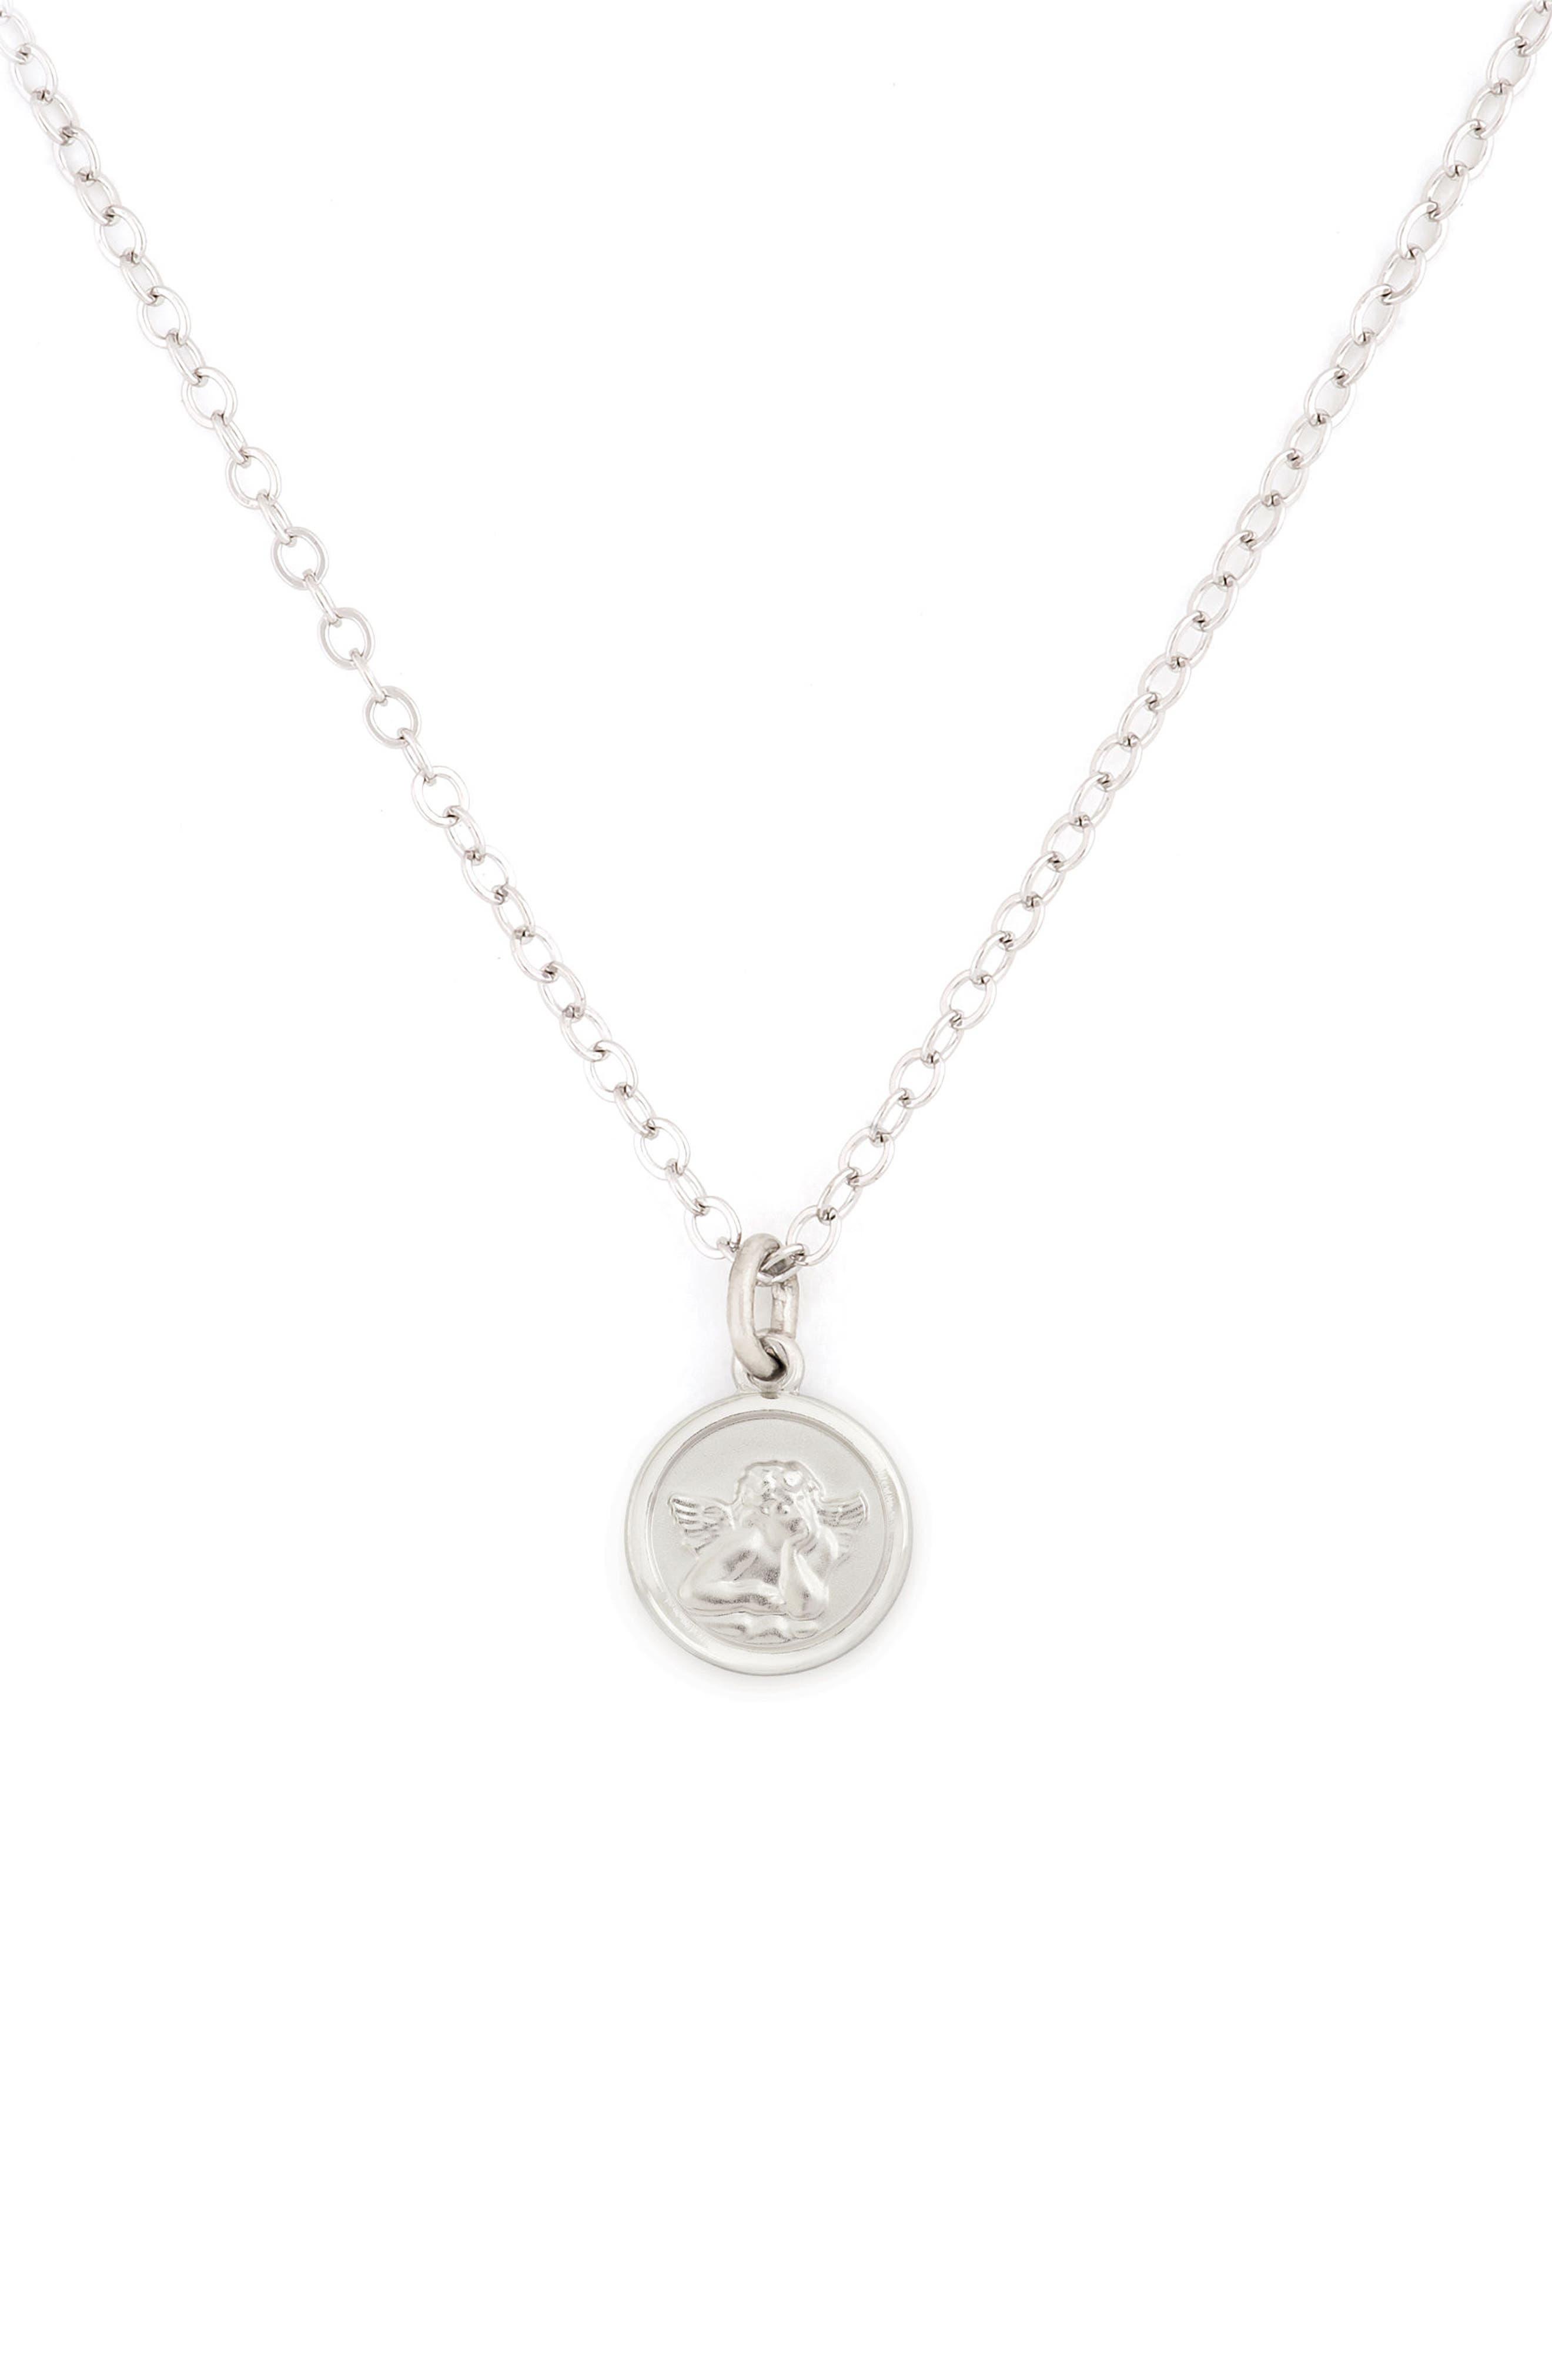 Main Image - Speidel Cherub Medal Sterling Silver Pendant Necklace (Girls)